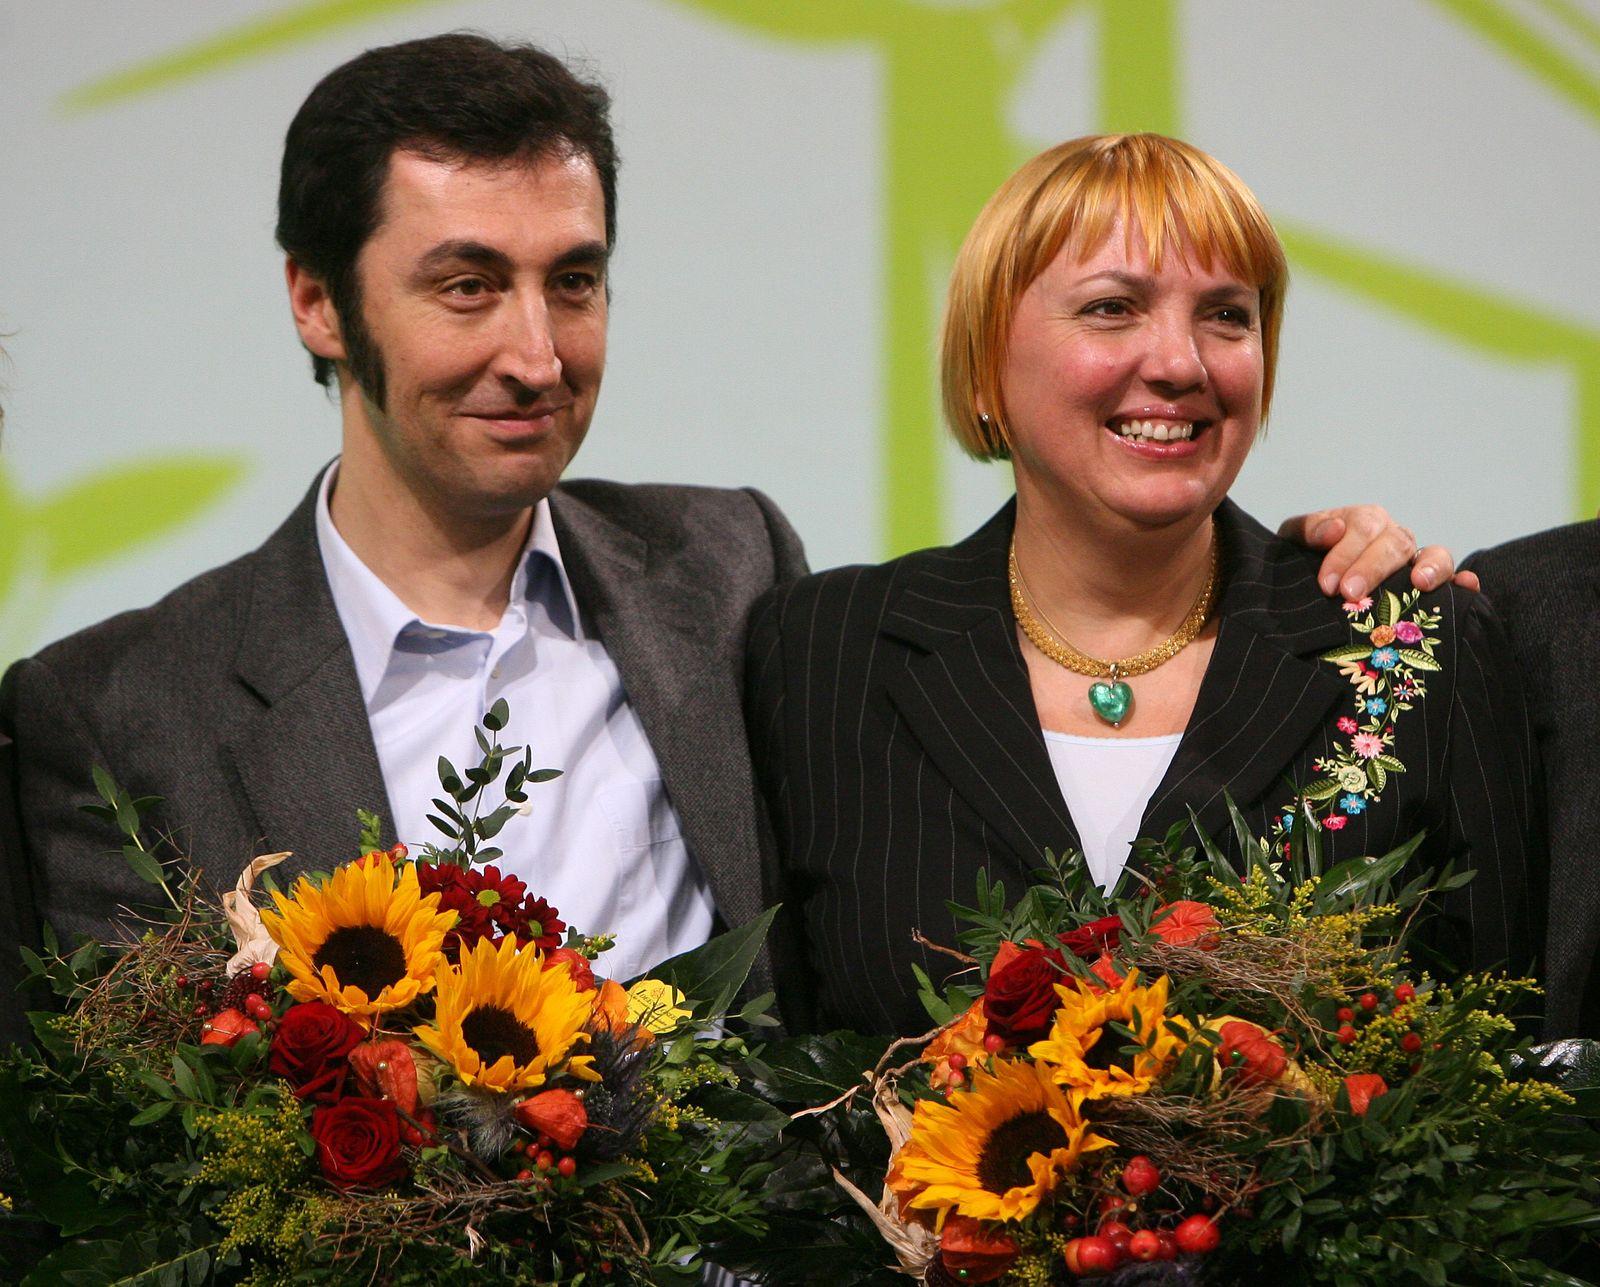 Bundesparteitag der Grünen in Erfurt - Özdemir Roth